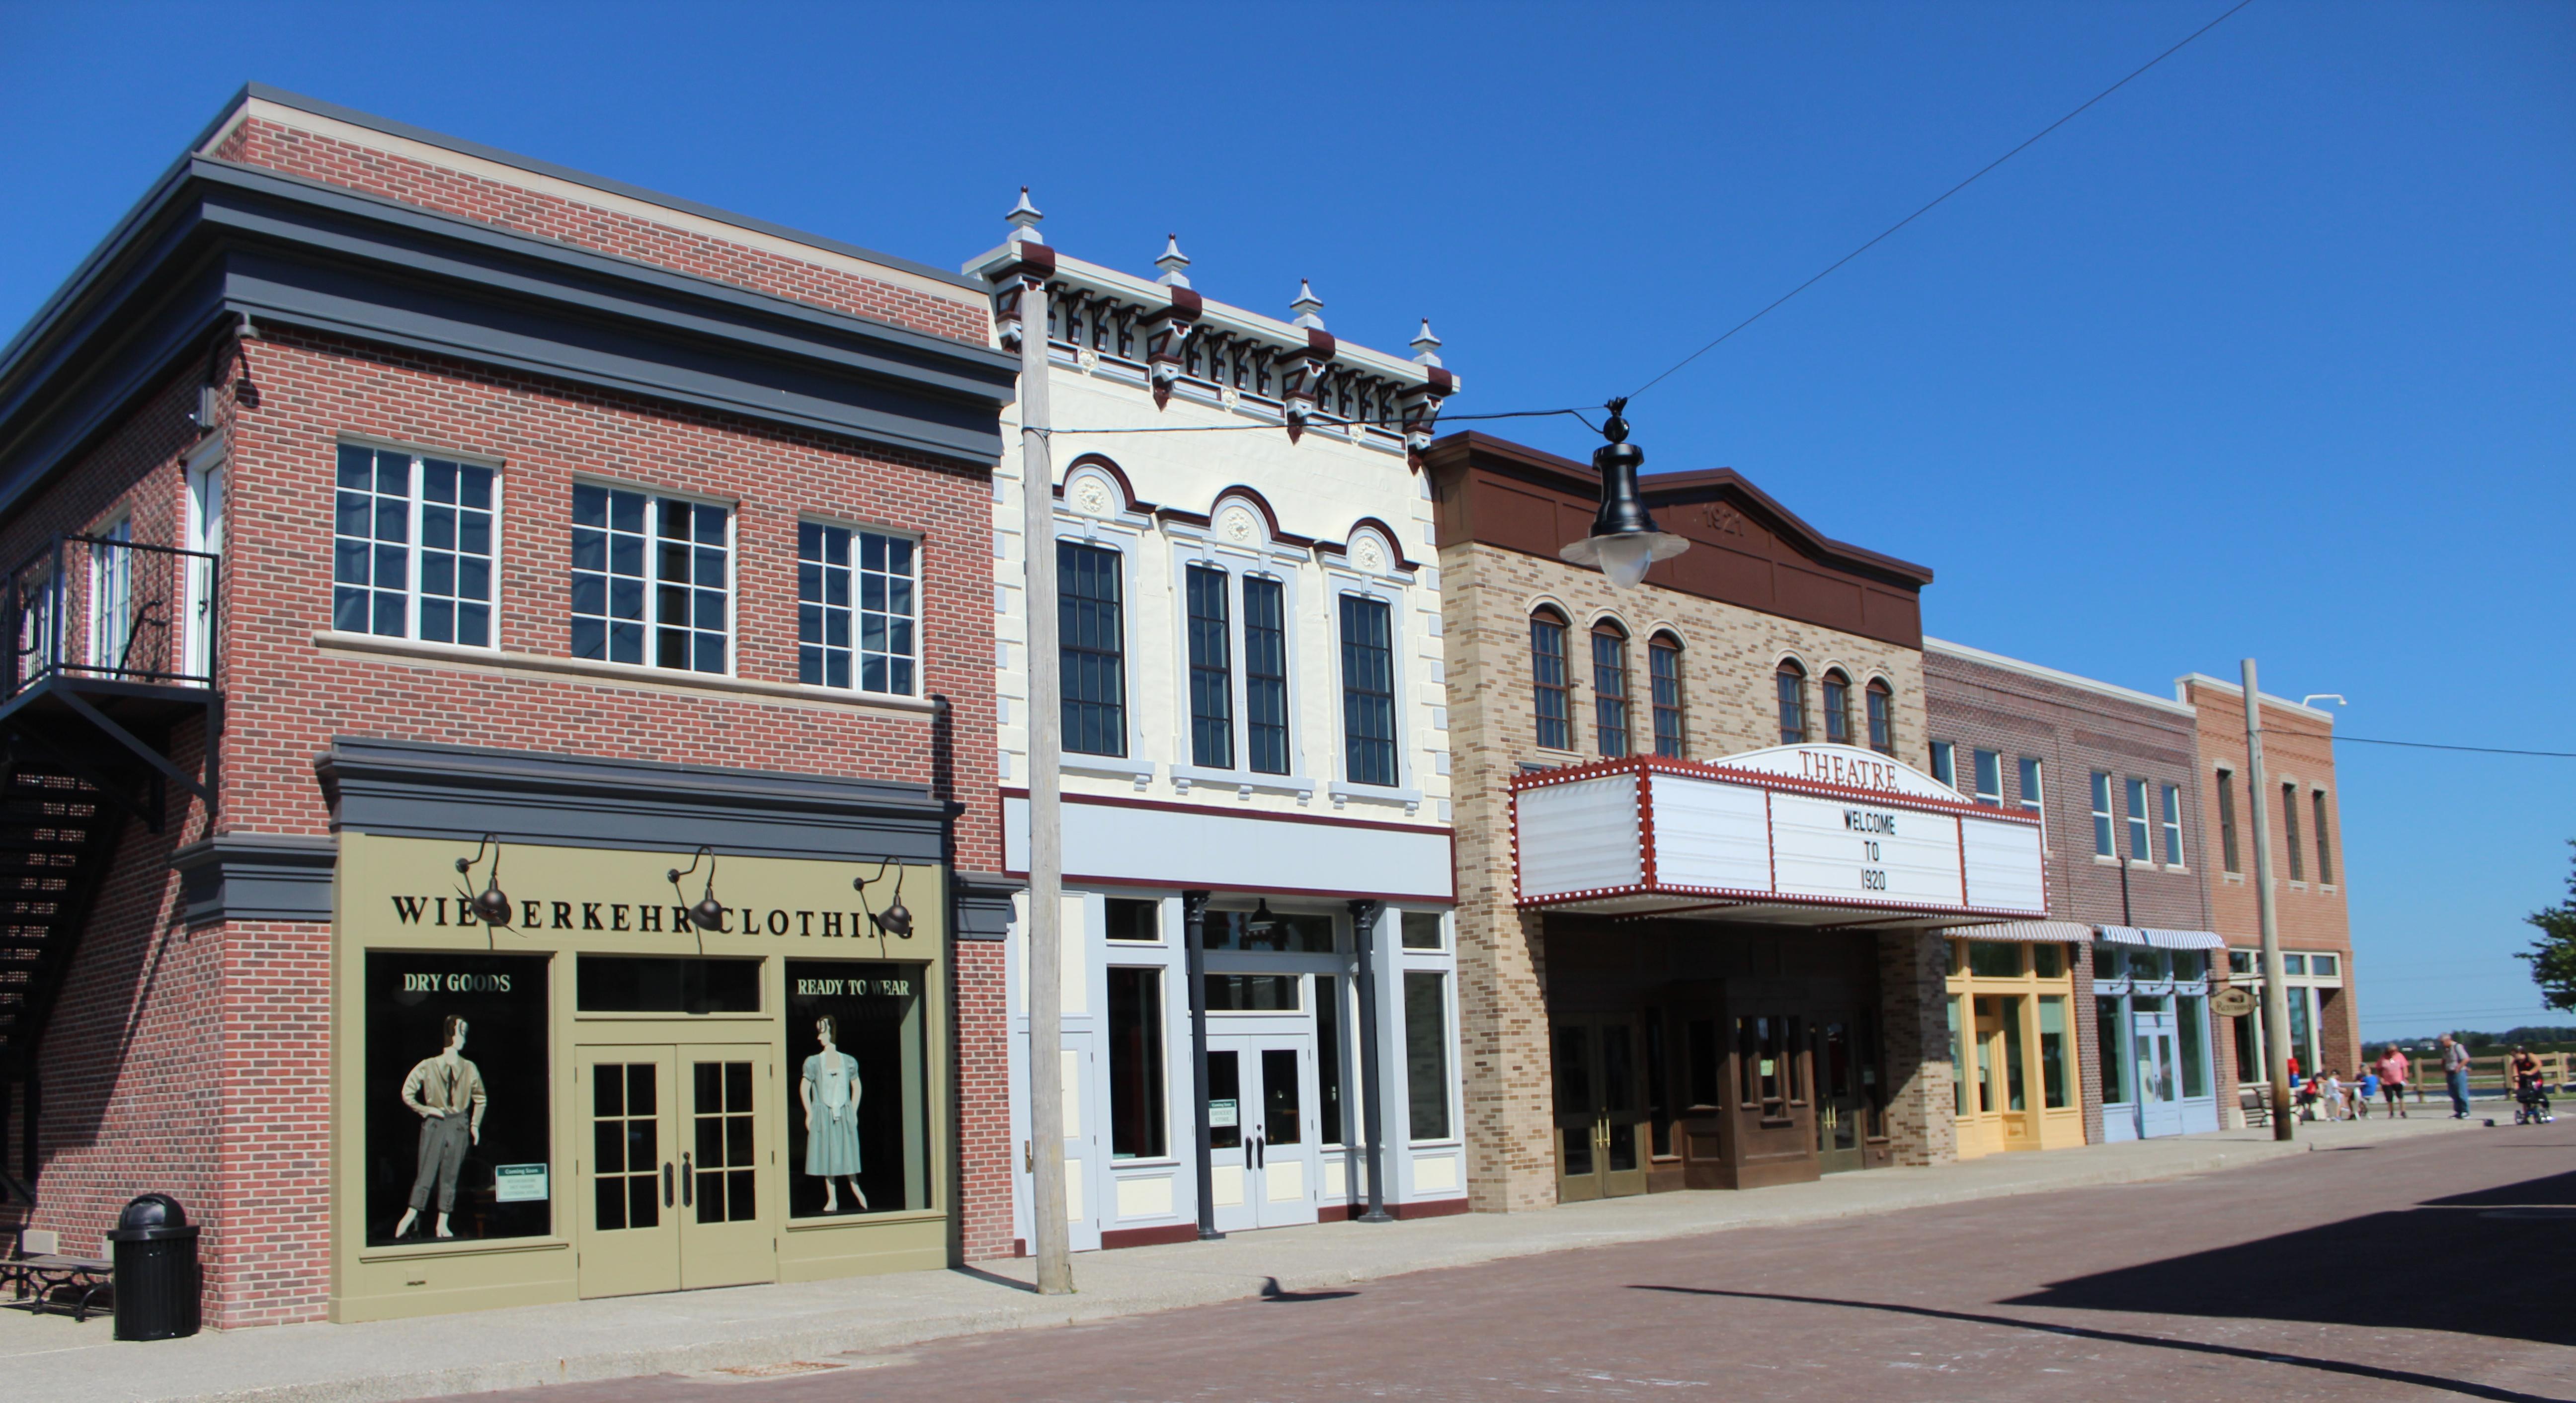 A series of vintage buildings line a 1920s-era Main Street.